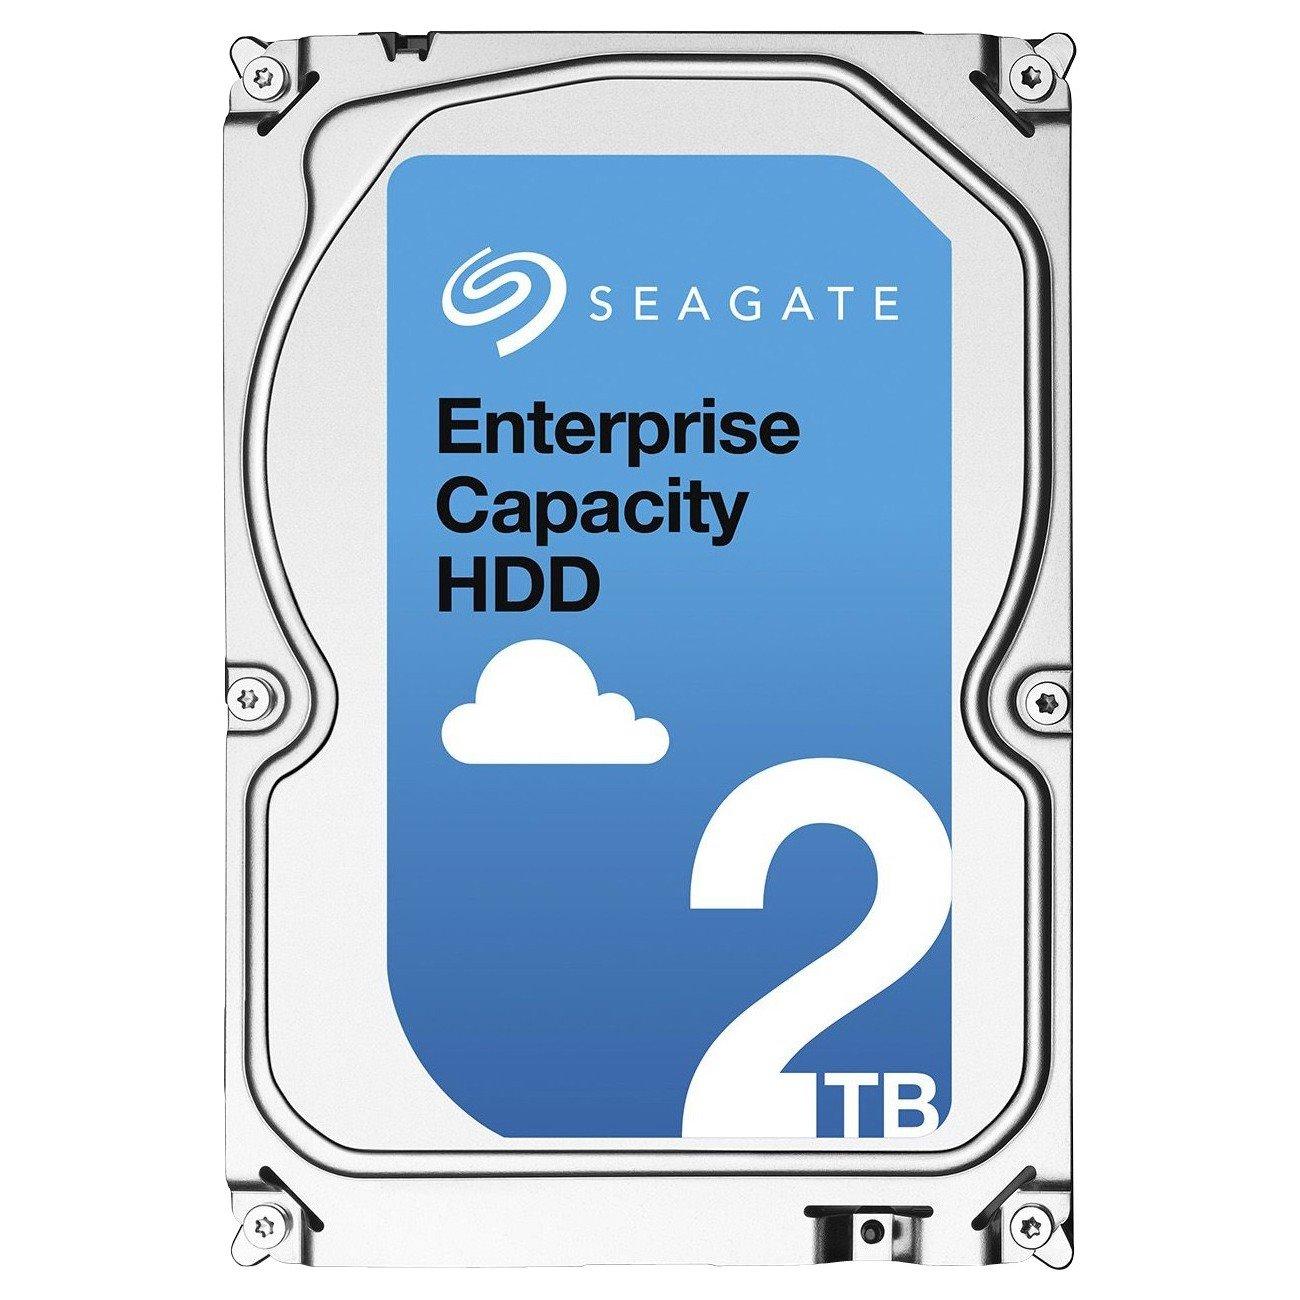 "Seagate ST2000NM0008 2 TB Hard Drive - SATA (SATA/600) - 3.5"" Drive - Internal"